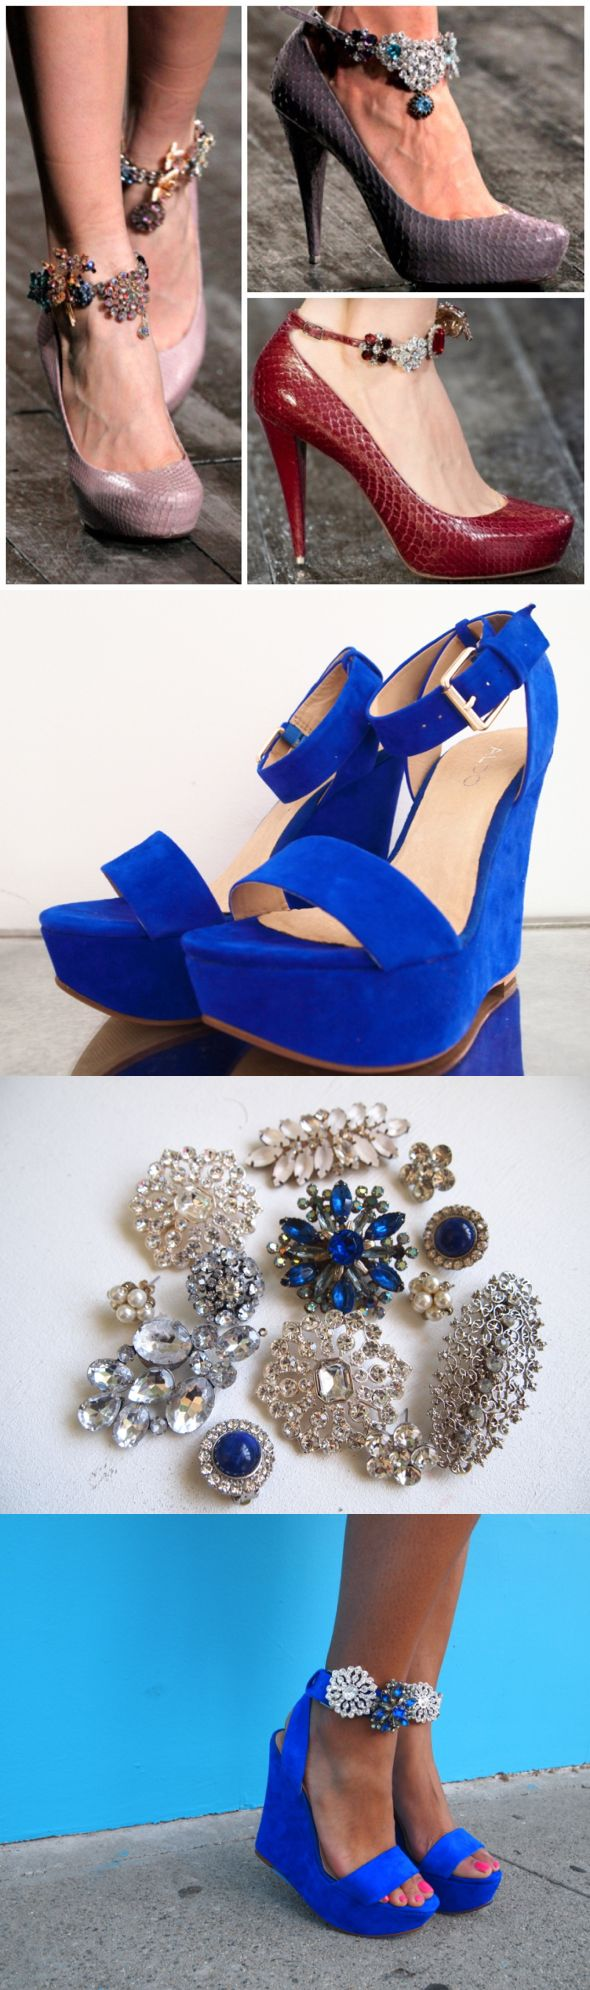 12 Fashionable DIY Ideas - Fashion Diva Design Daily update on my blog: ediy3.com